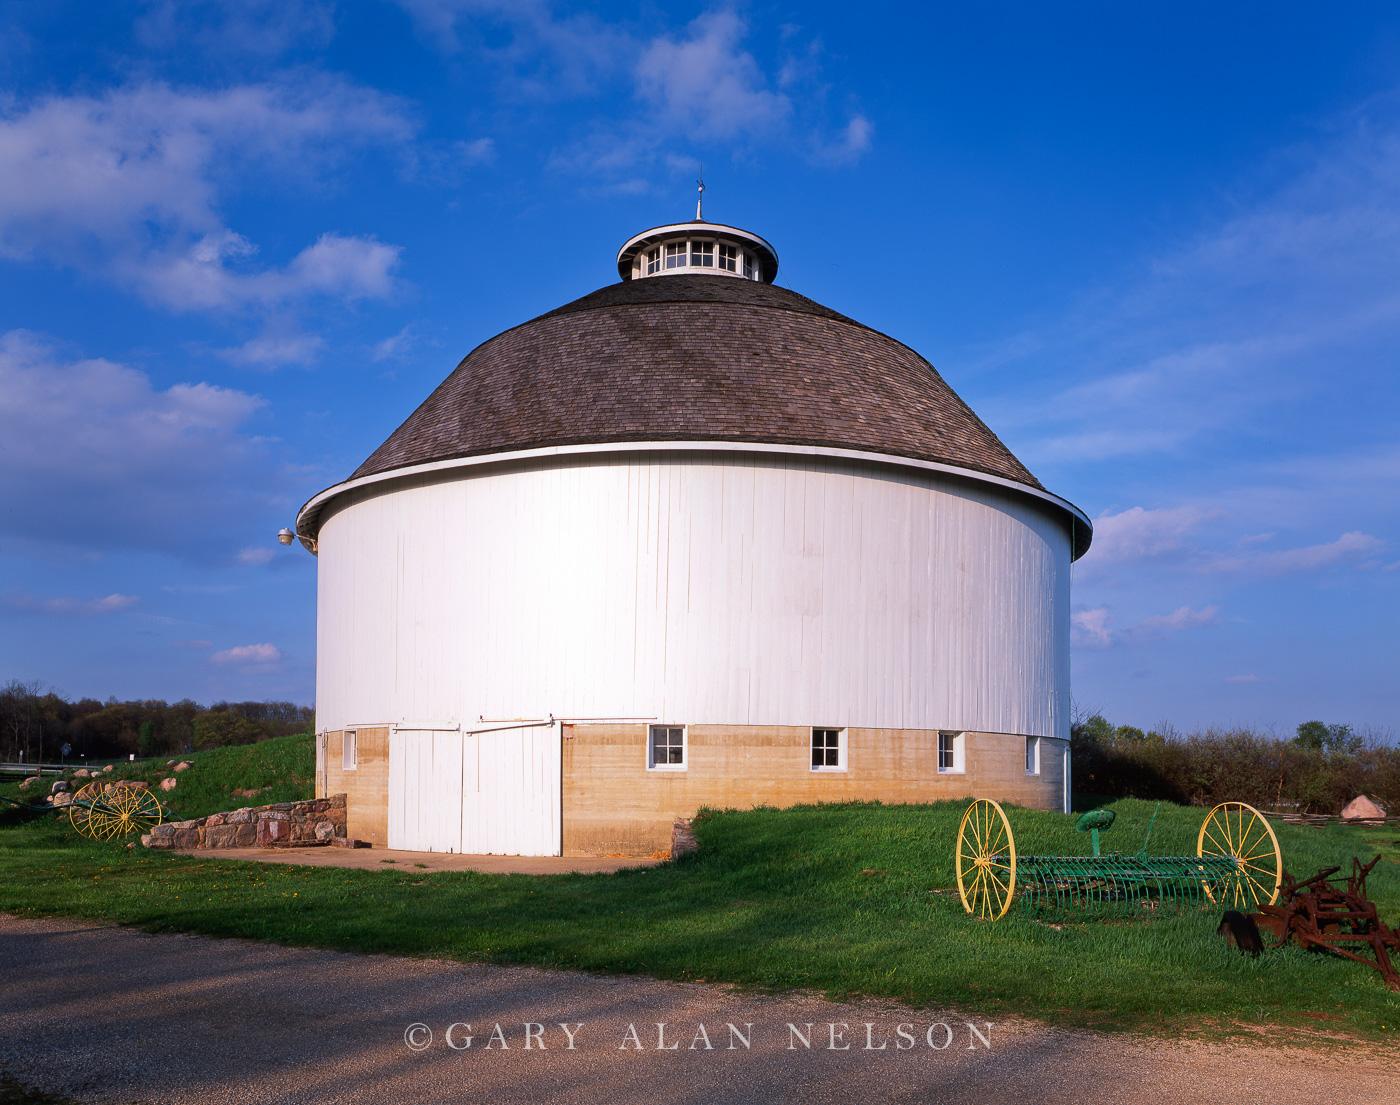 The Paxton Round Barn Fulton County Indiana Gary Alan